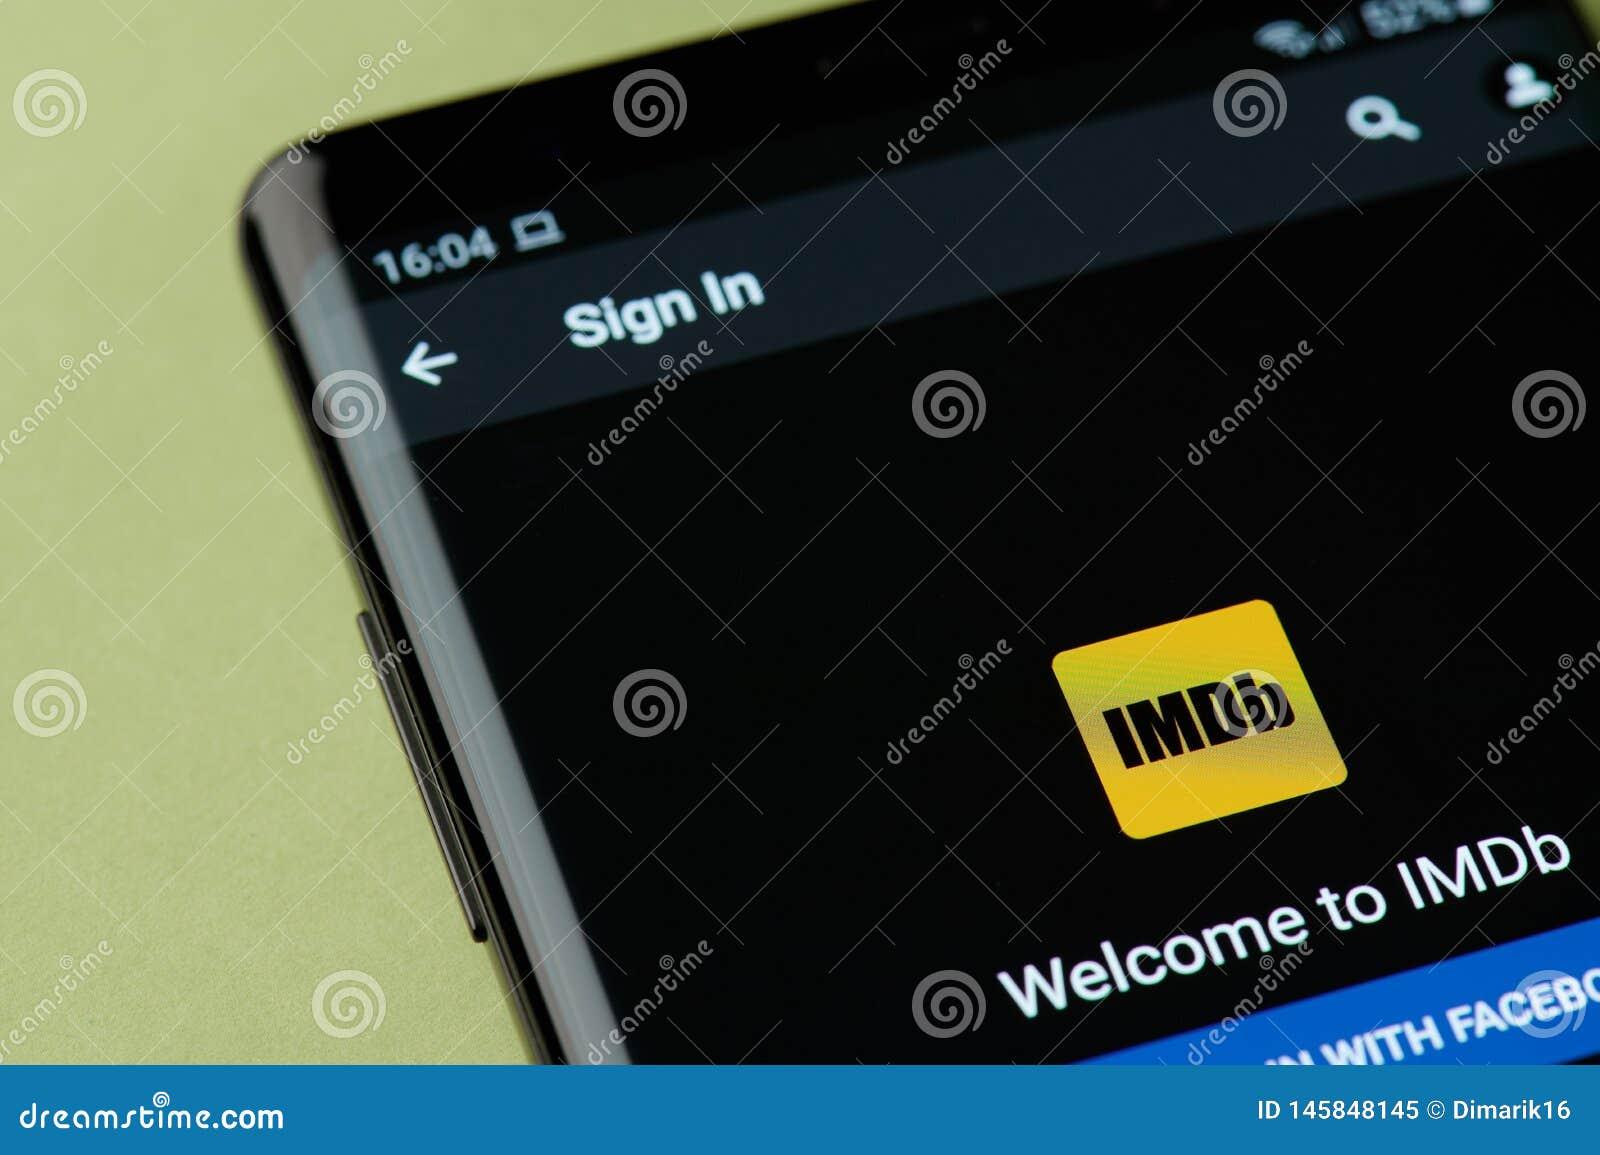 Sign in in IMDb editorial image  Image of illustrative